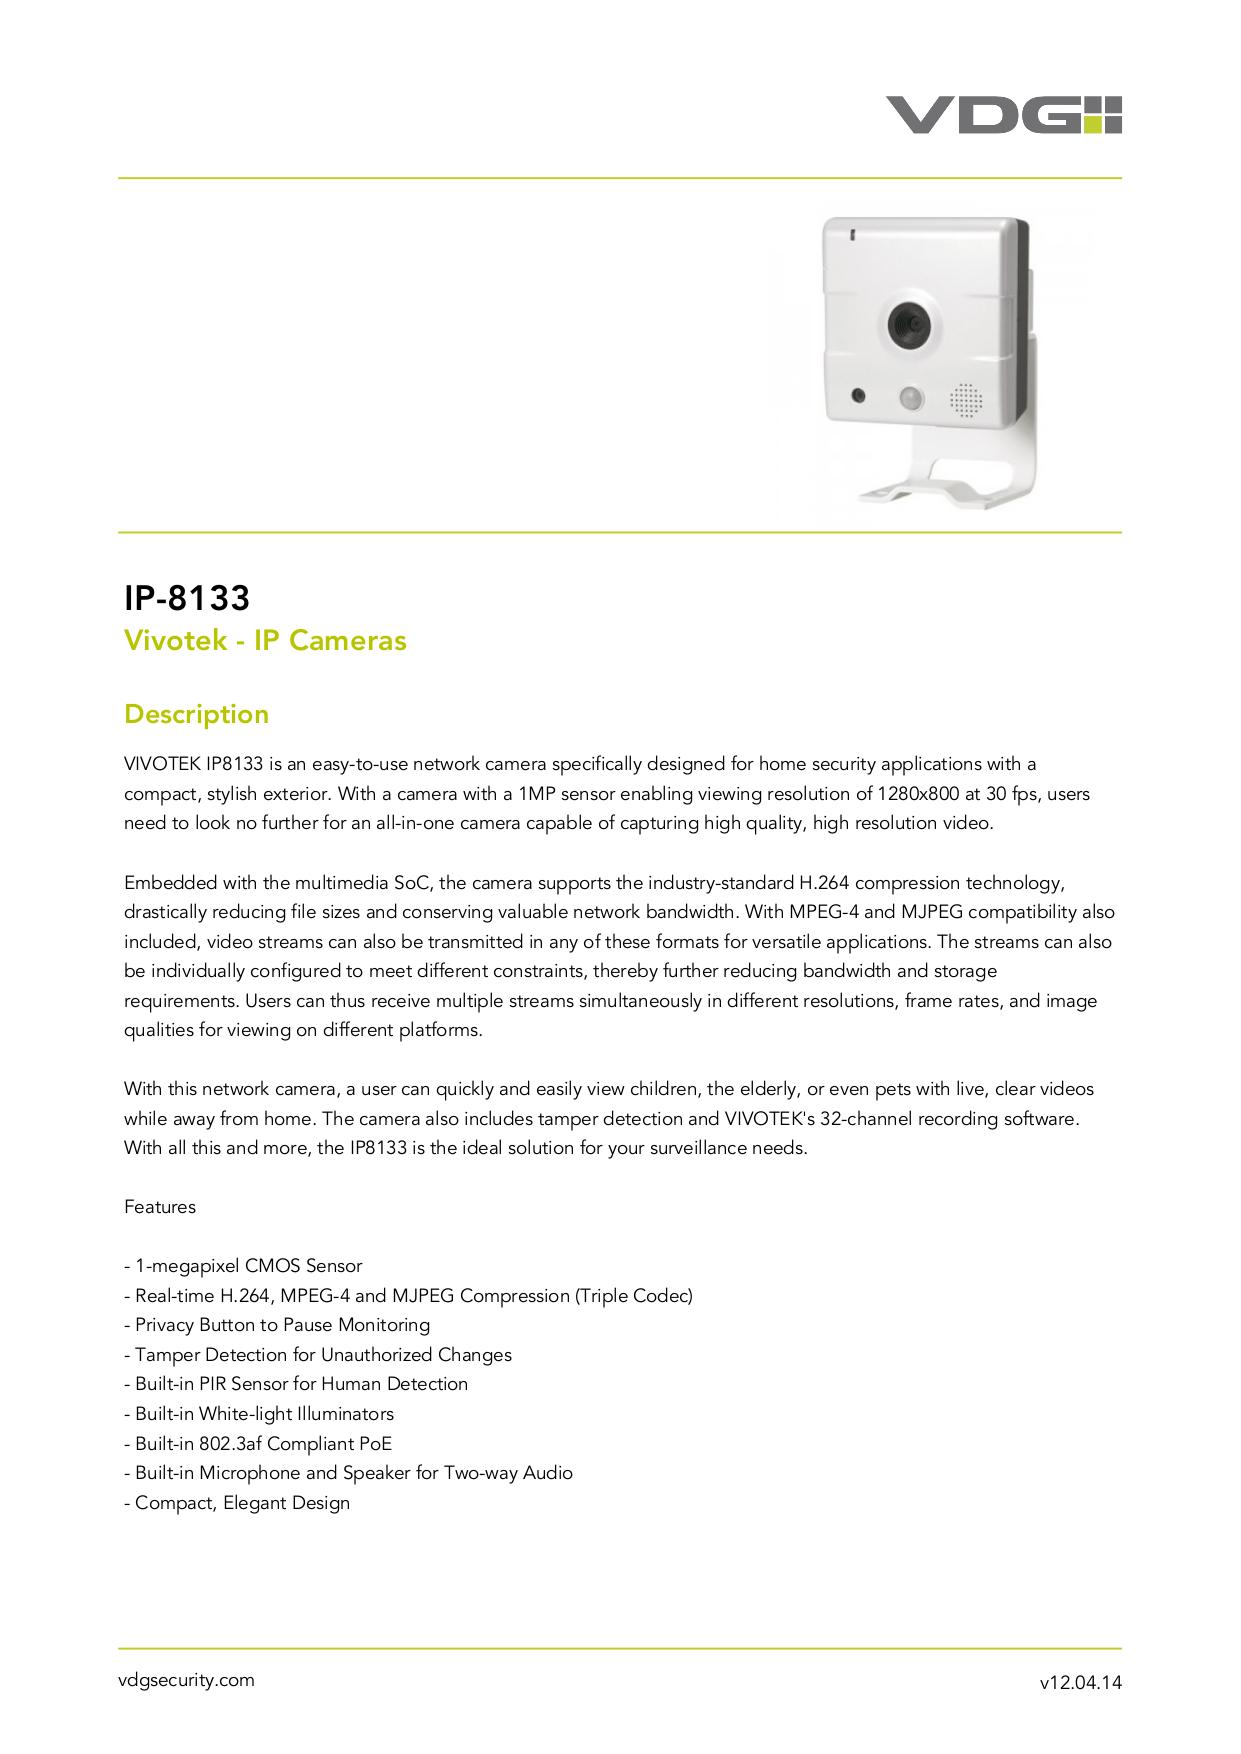 pdf for Vivotek Security Camera IP8133 manual